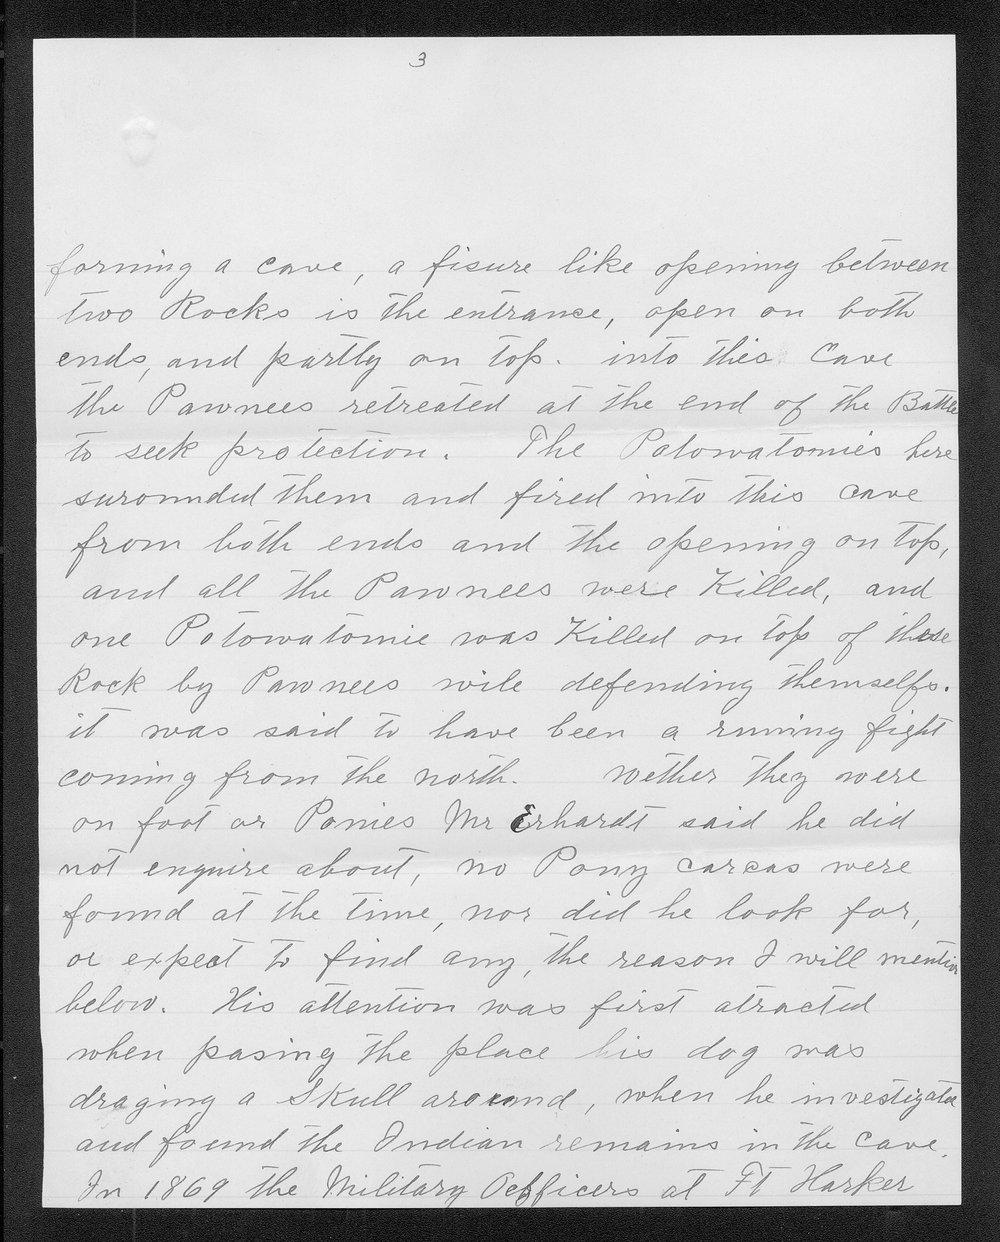 Adolph Roenigk and George W. Martin correspondence - 3